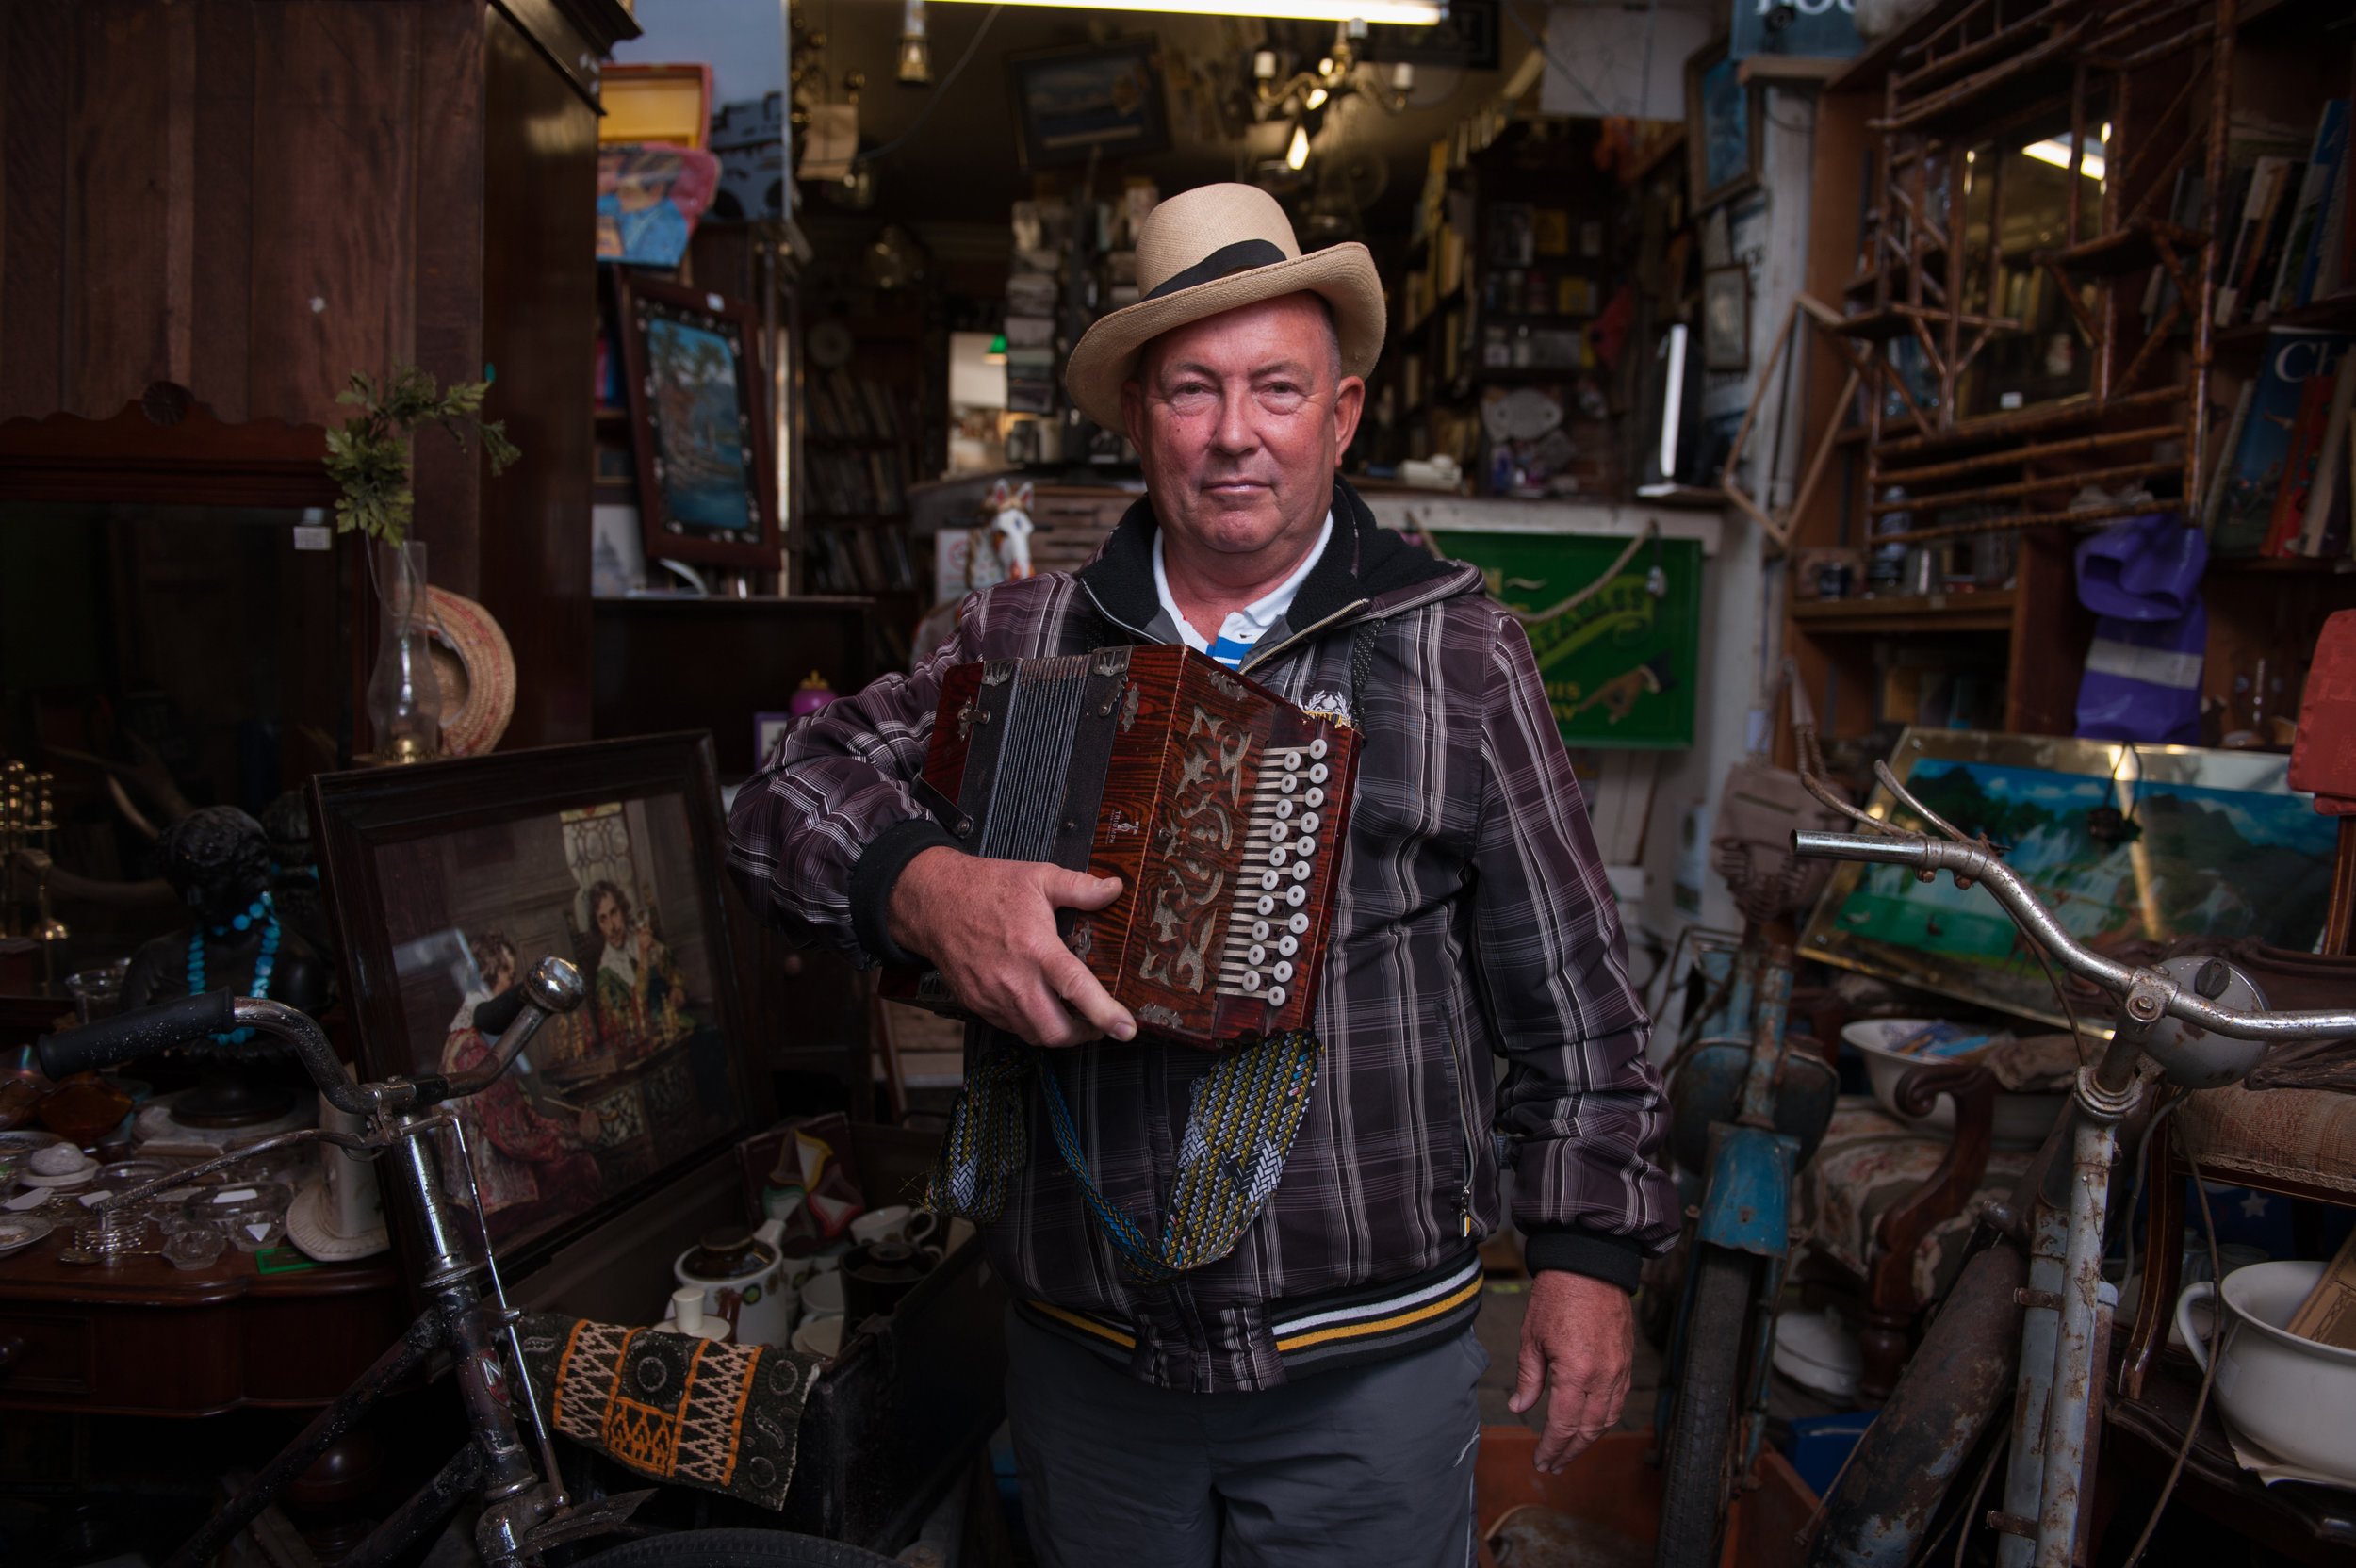 Ian, The Antique Seller